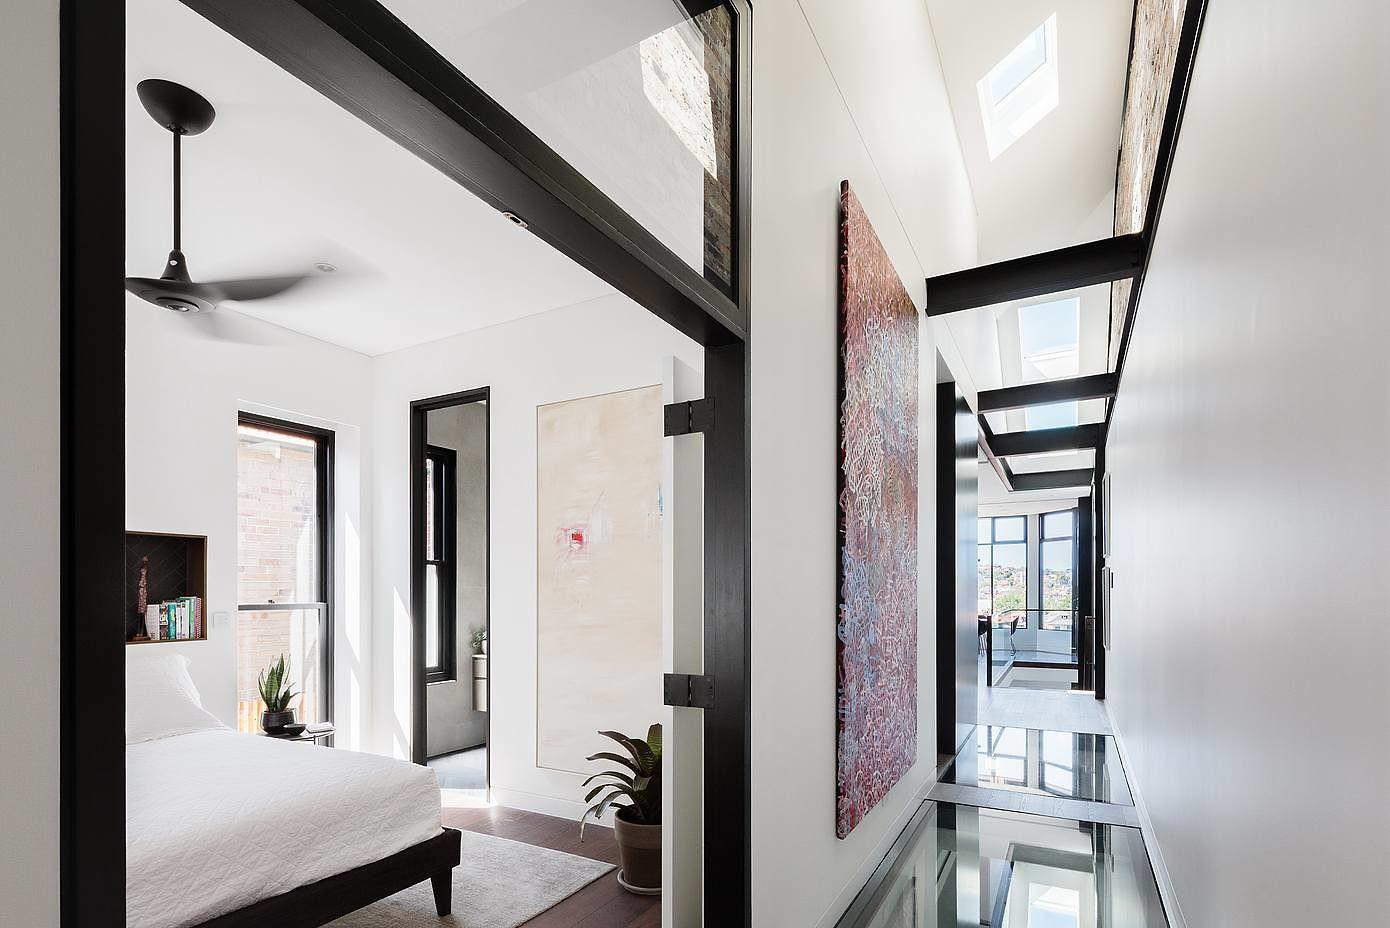 Doorzien House by Bijl Architecture